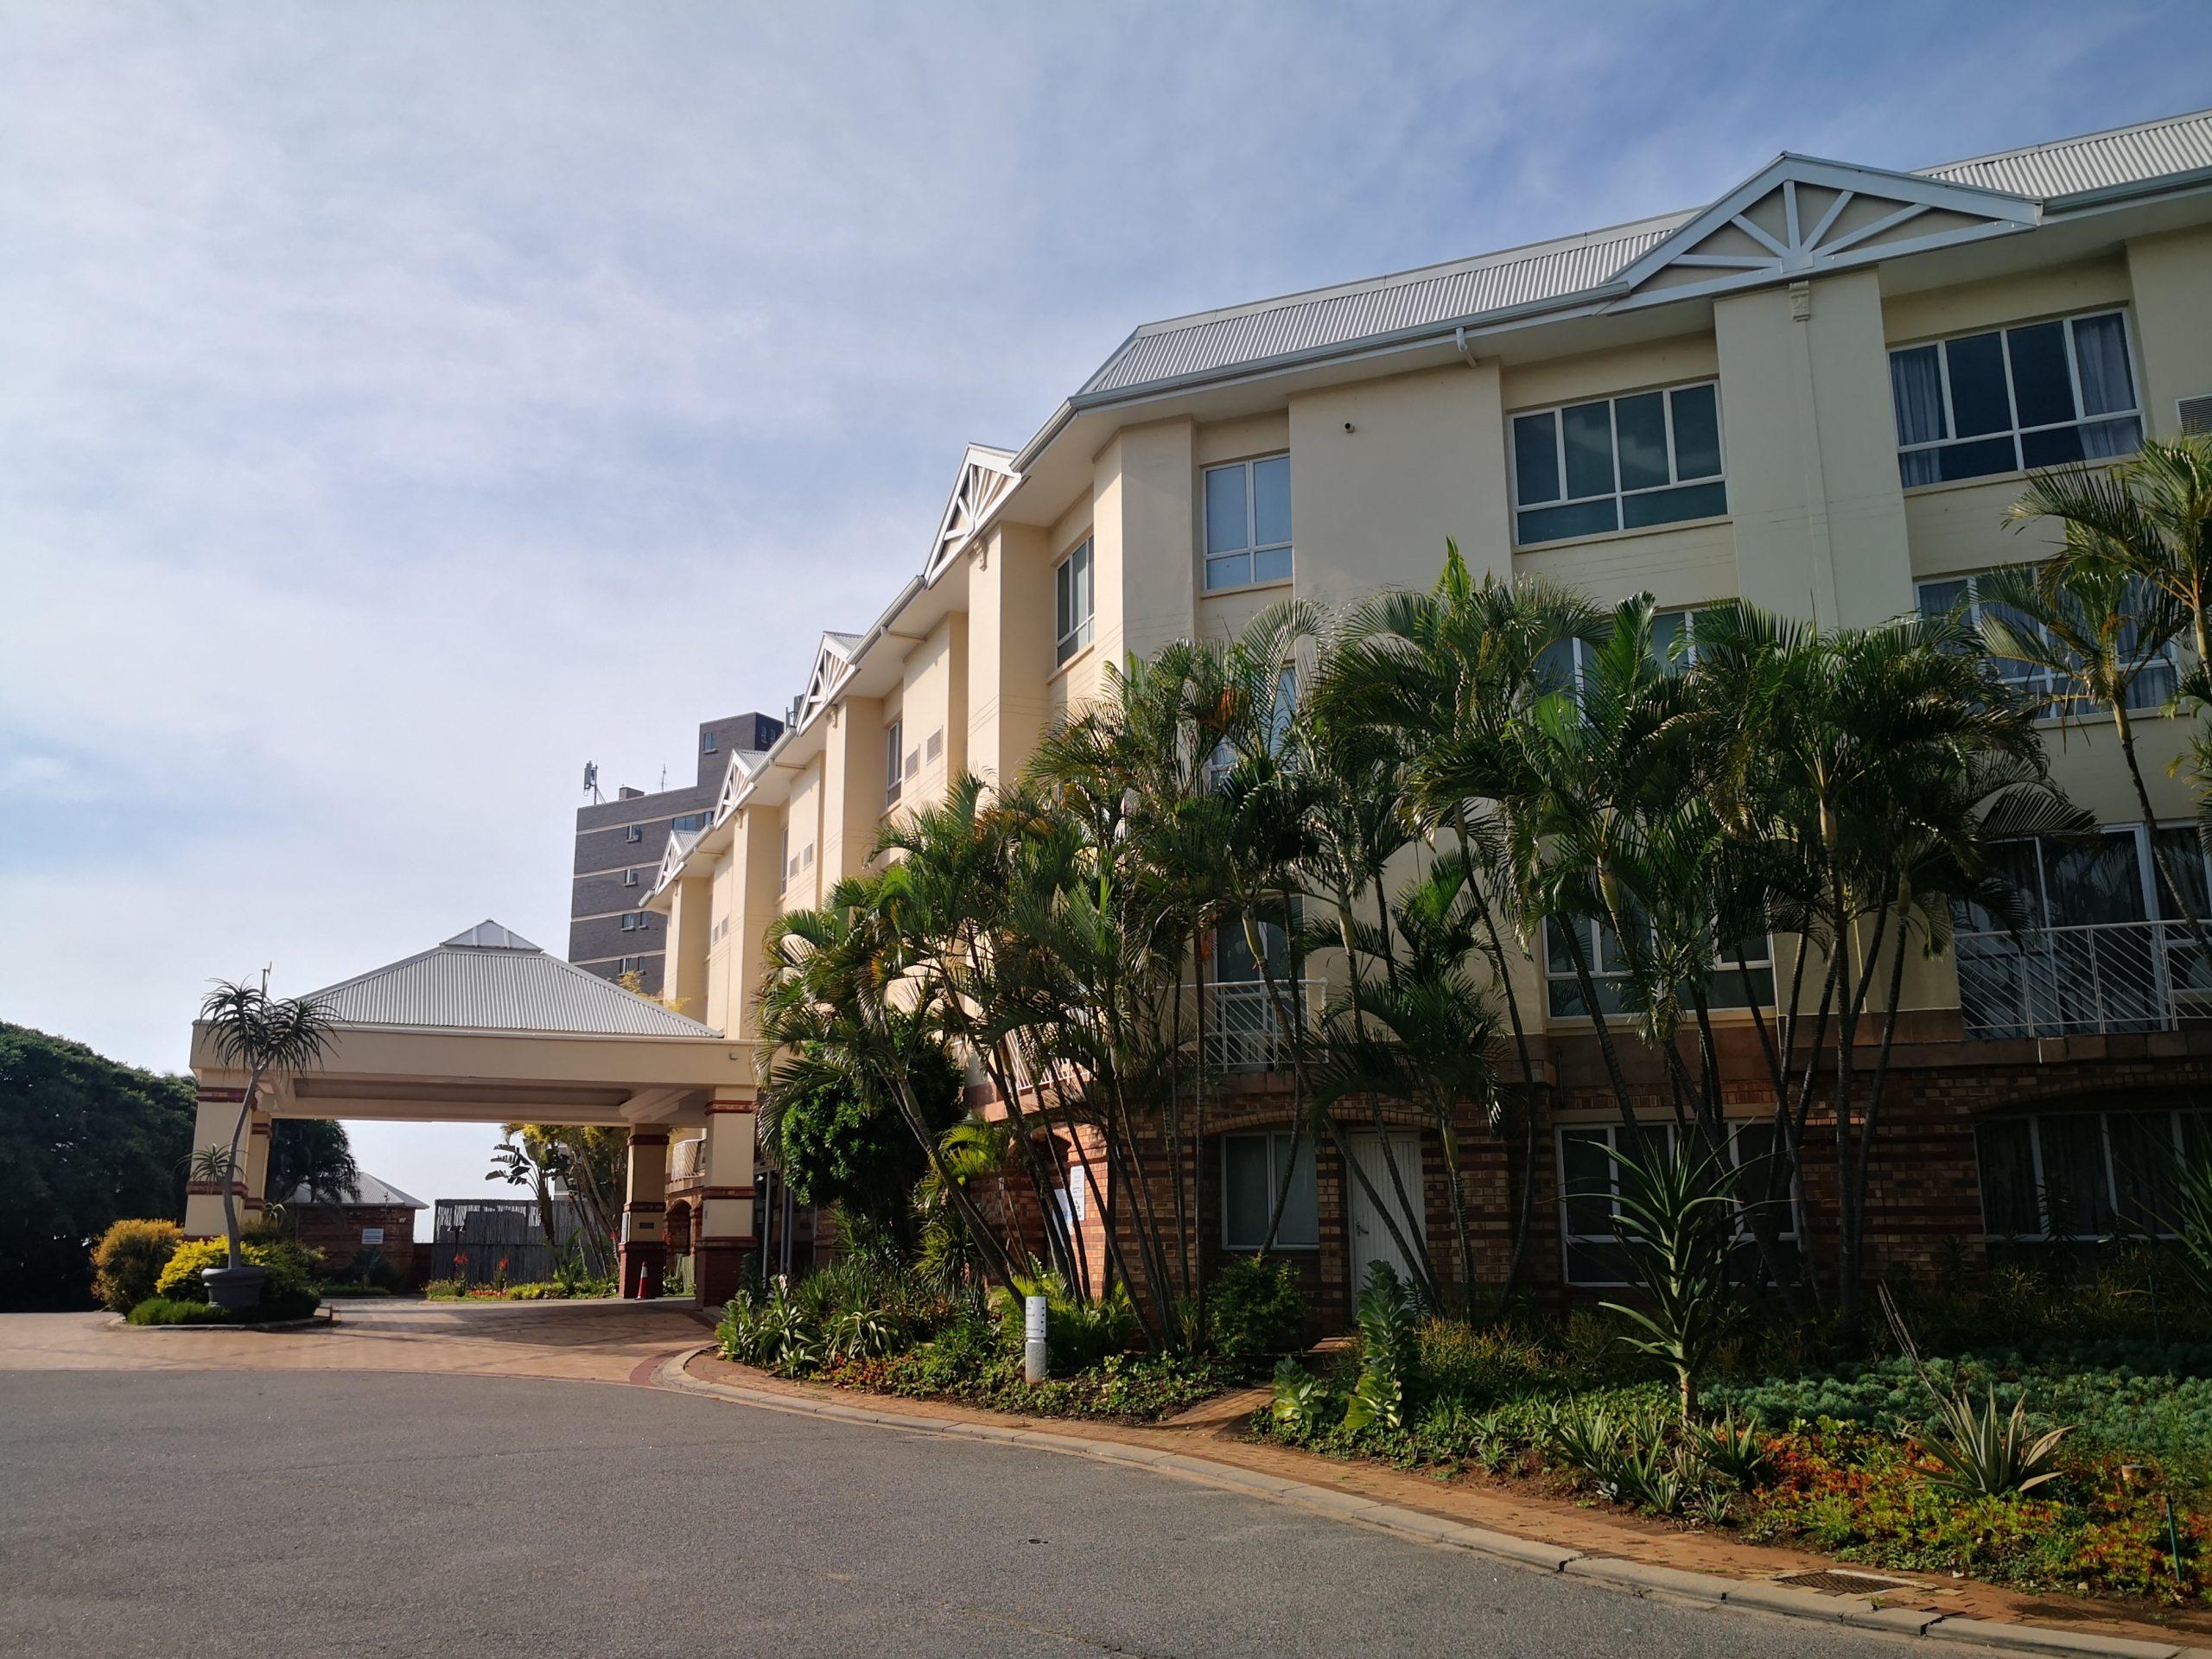 The Riverside Hotel